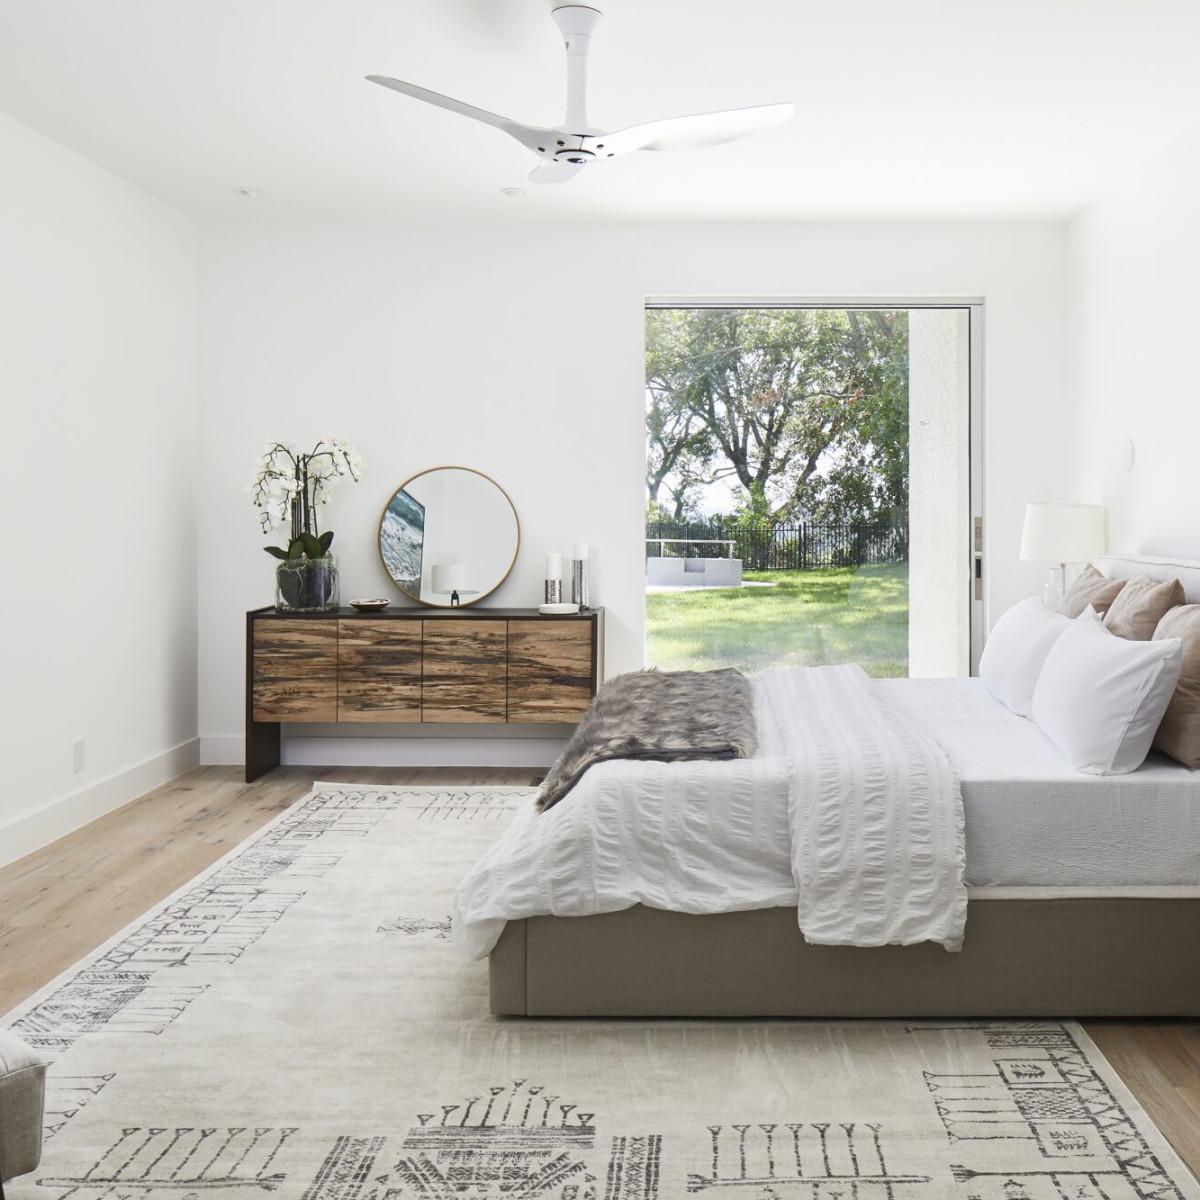 CG&S Concrete Remodel: bedroom